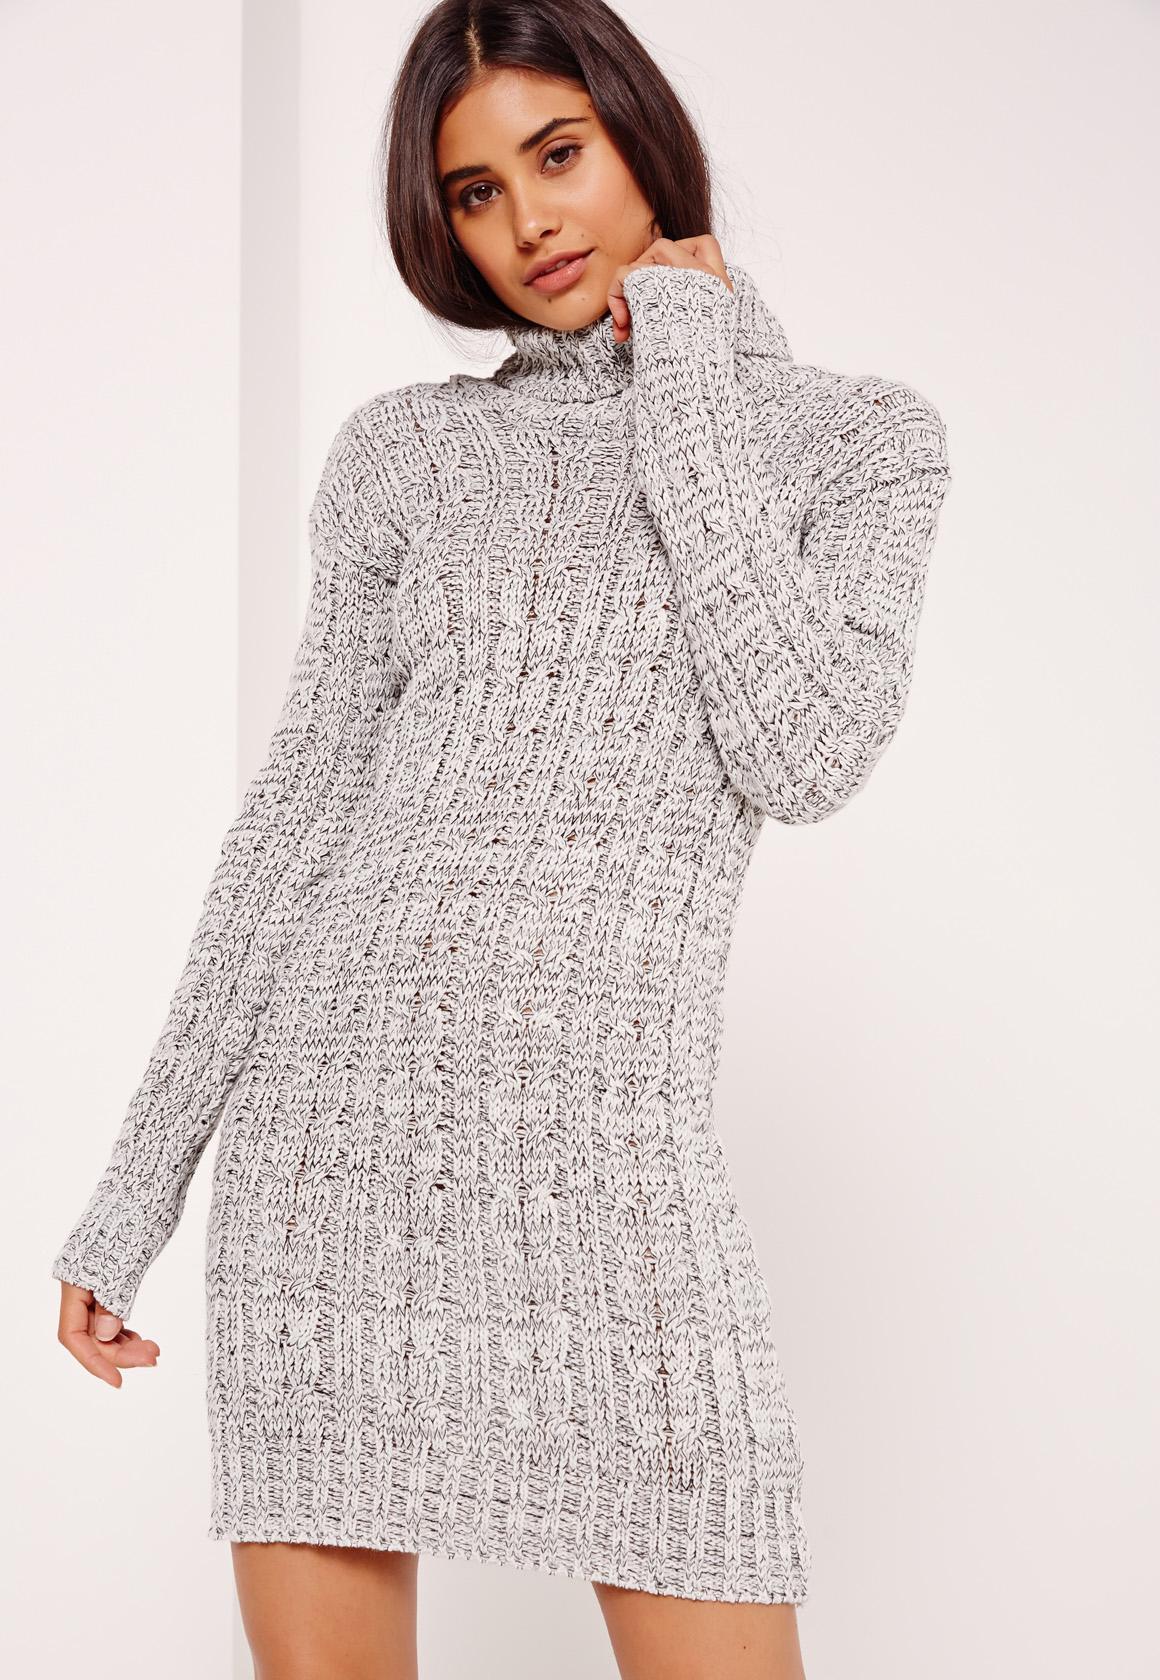 knitted dress previous next kfkdgbd